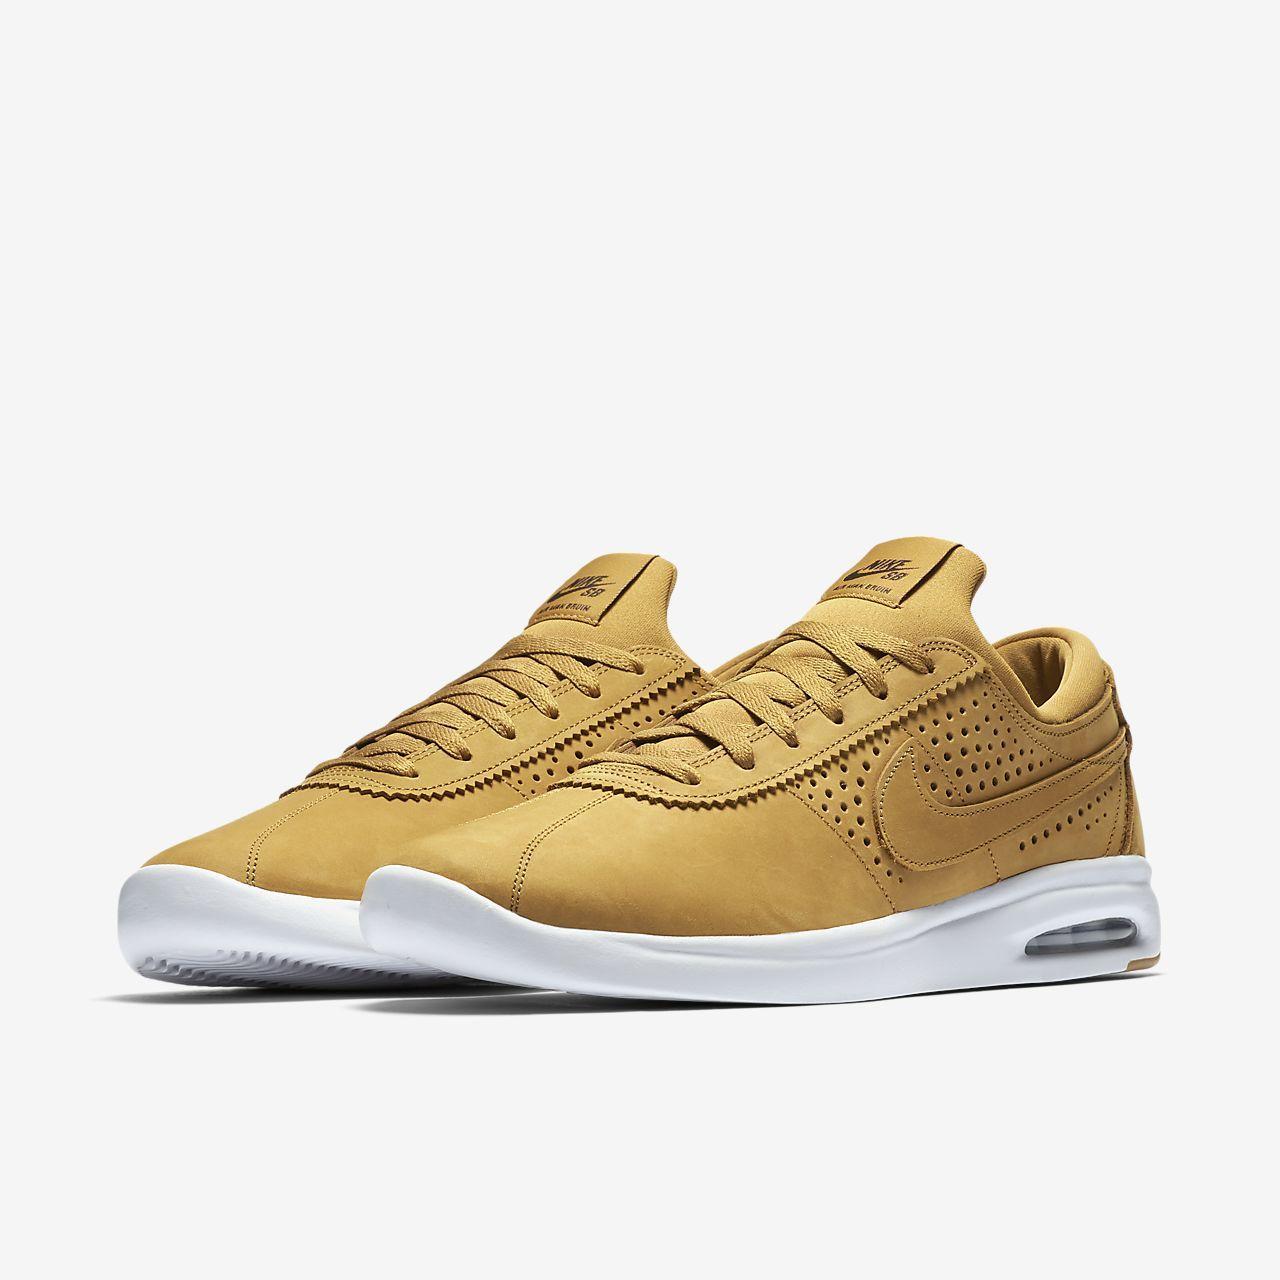 5 Nike SB Air Max Bruin Vapor Cuir pour Homme Skateboarding Chaussures Satorisan SOMERVILLE162017 Sneakers Homme Crème 42 Chaussures Gant marron Fashion homme KeOiSIzW78